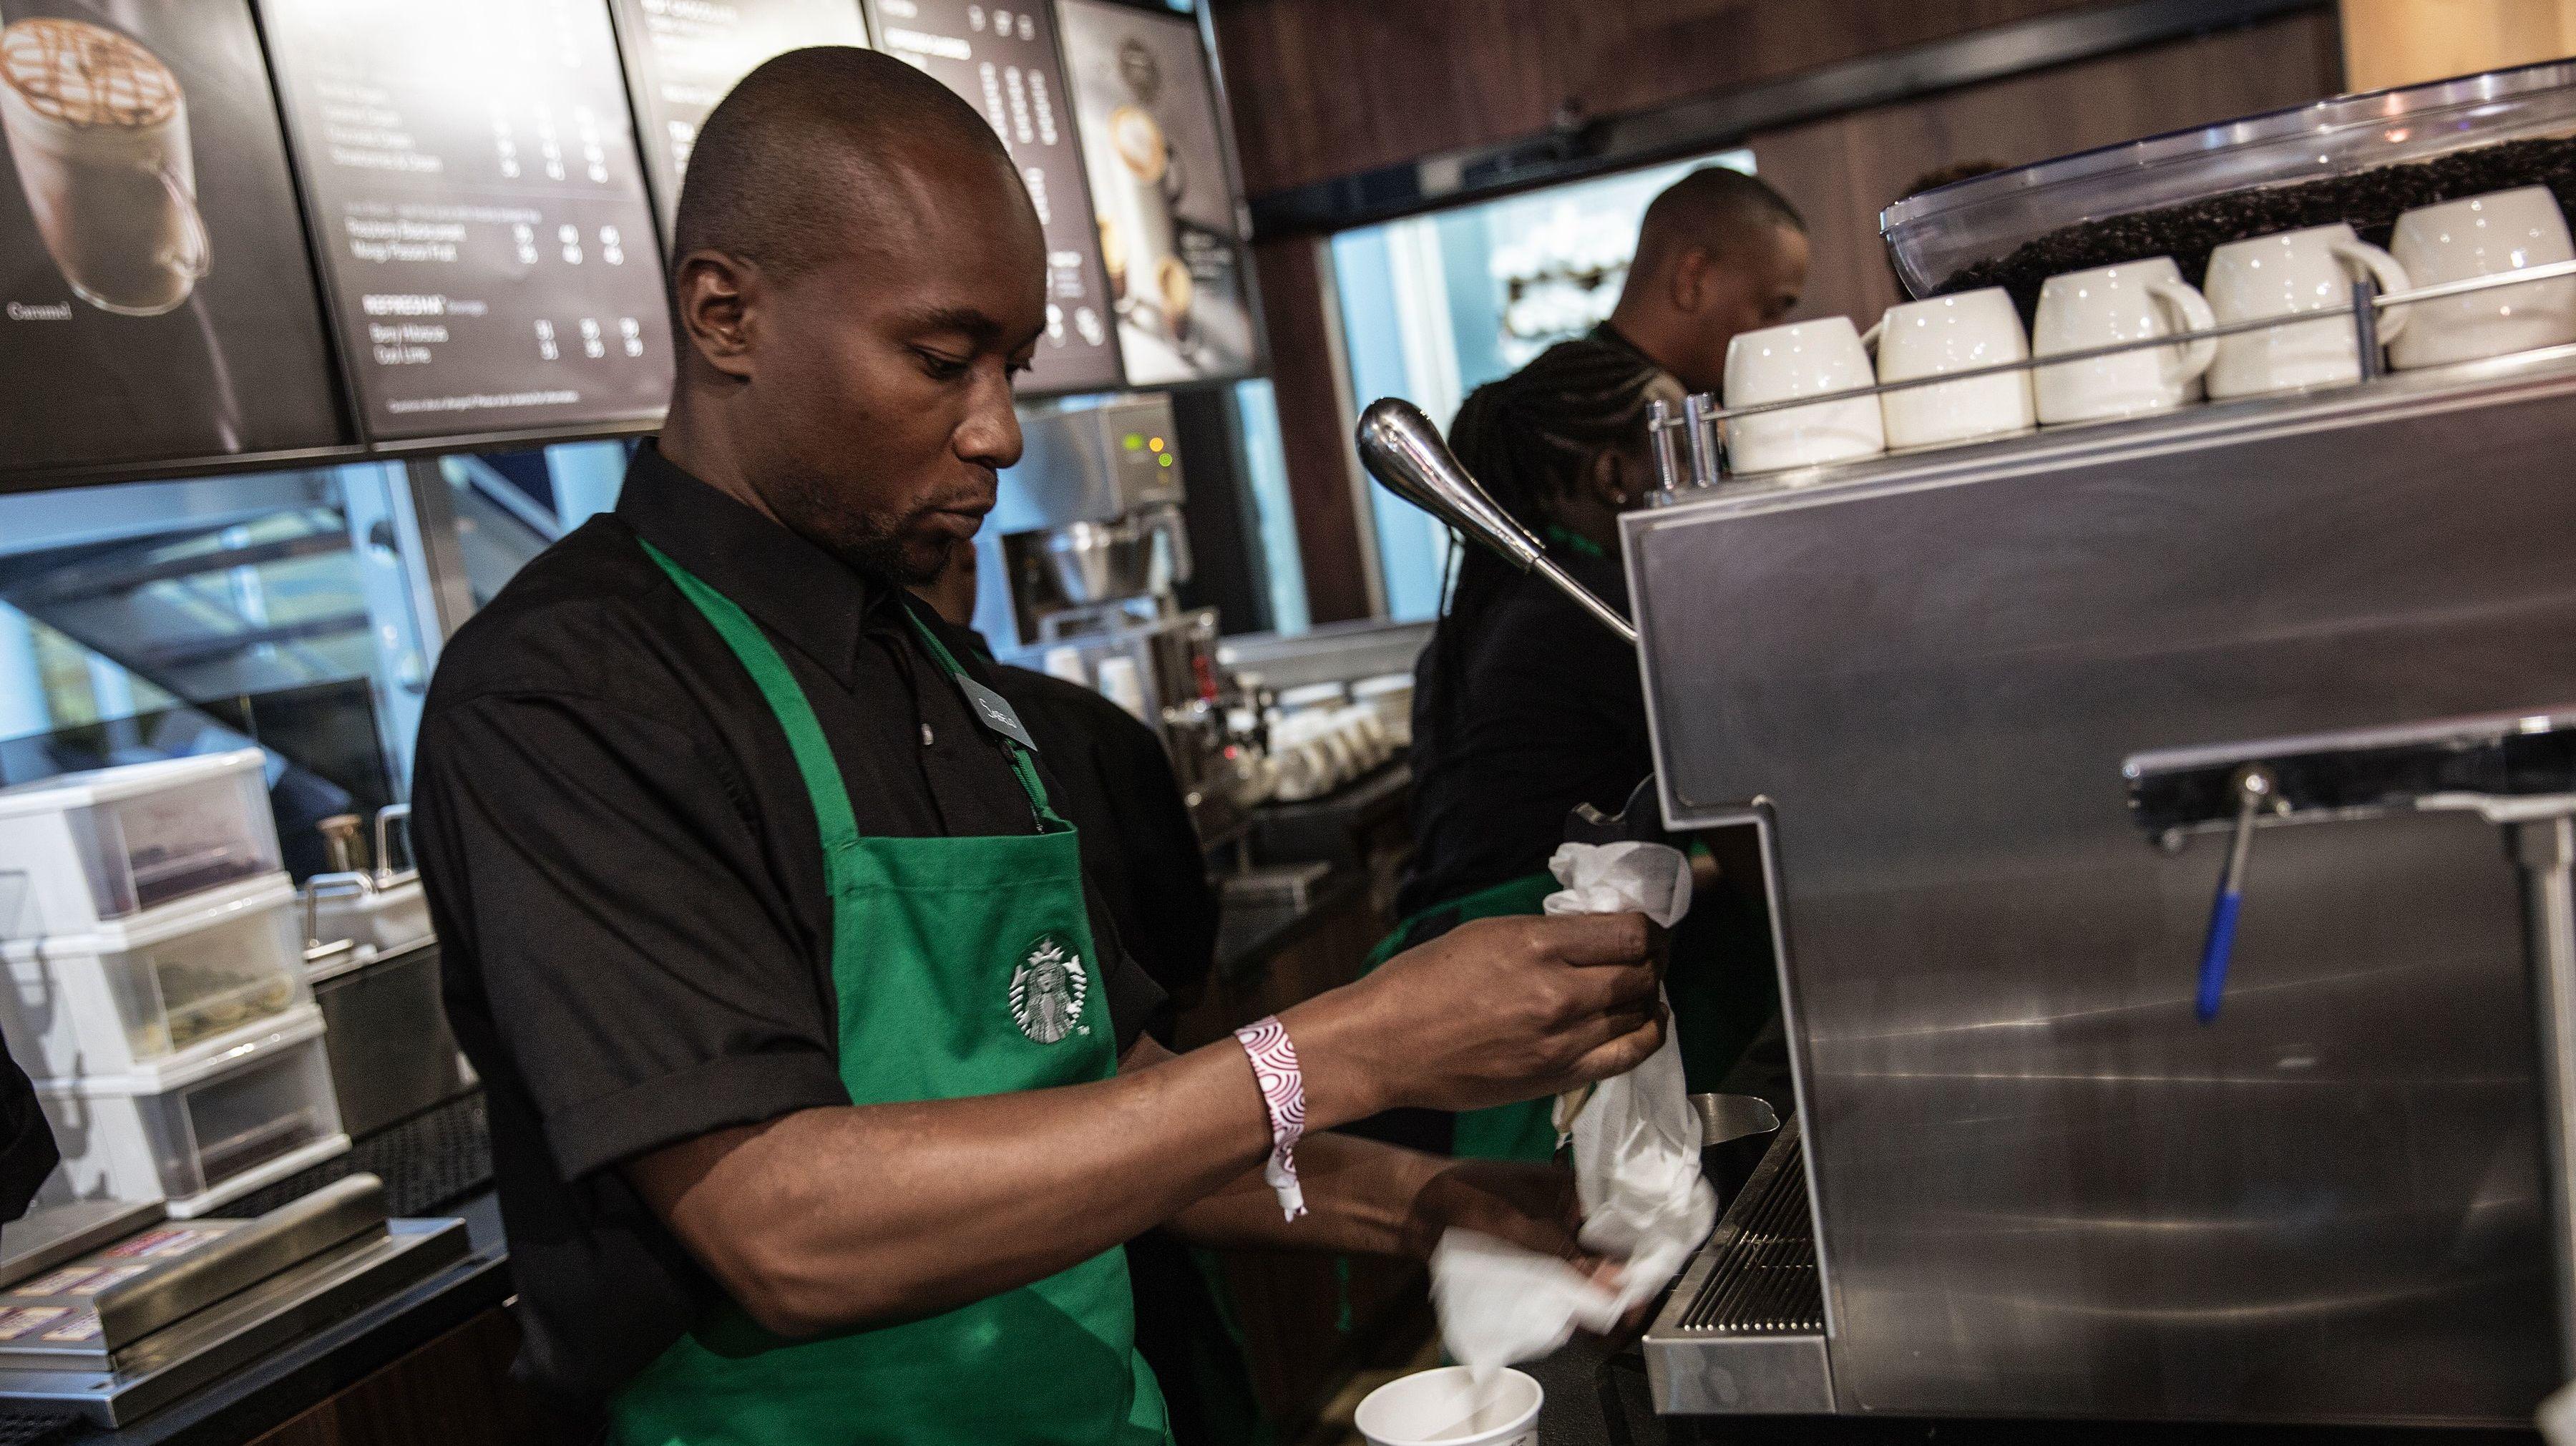 0b69f39a773 12 Secrets of Starbucks Employees | Mental Floss